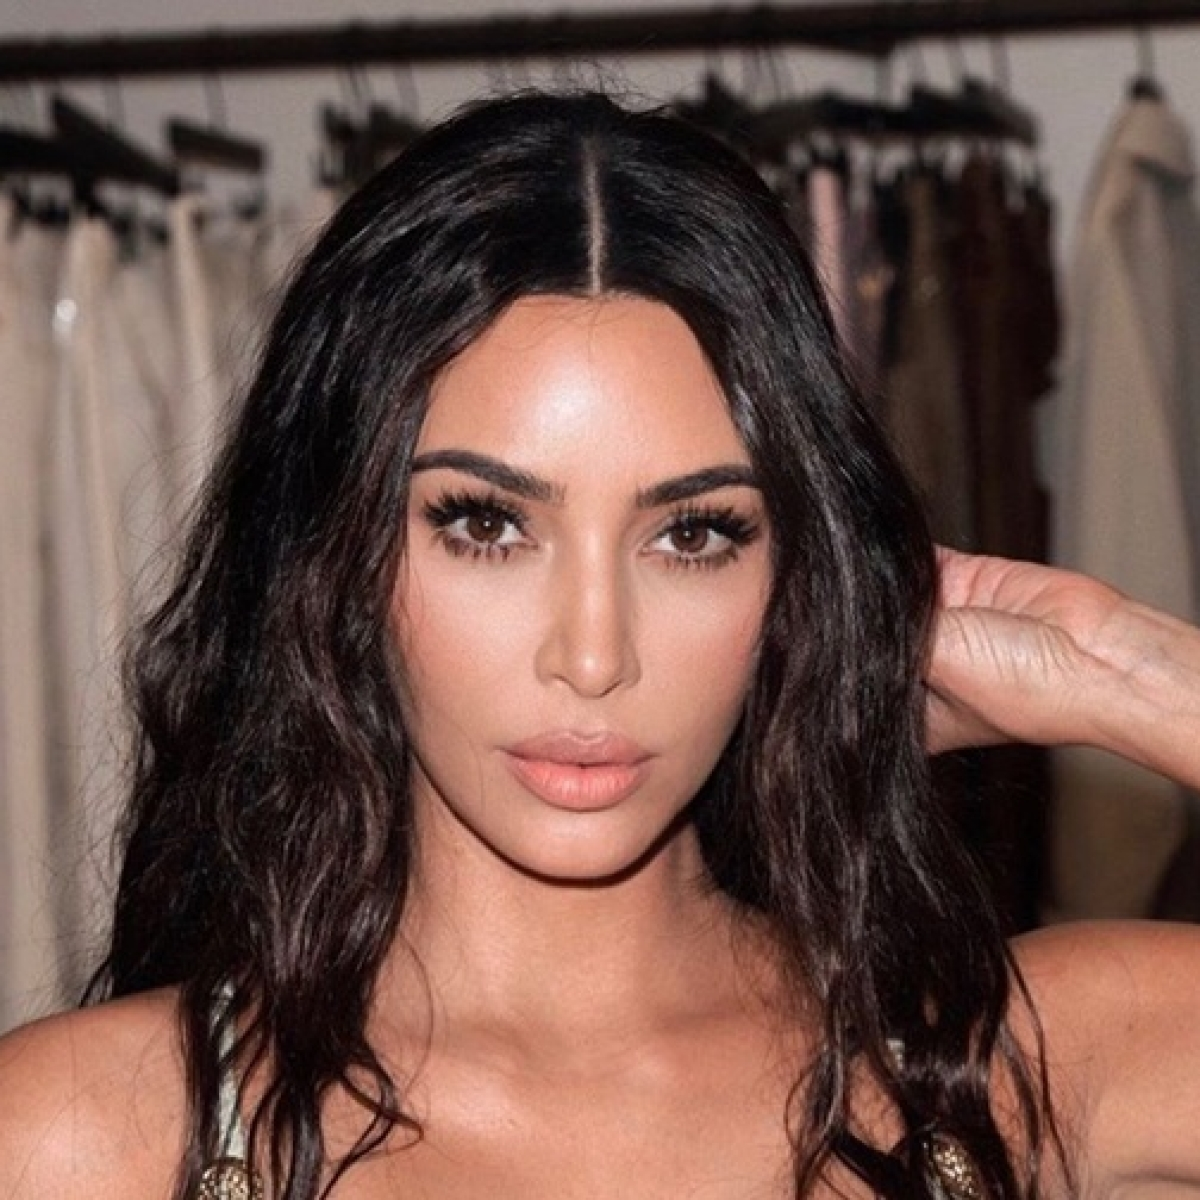 Kim Kardashian believes her son Psalm is the reincarnation of her father